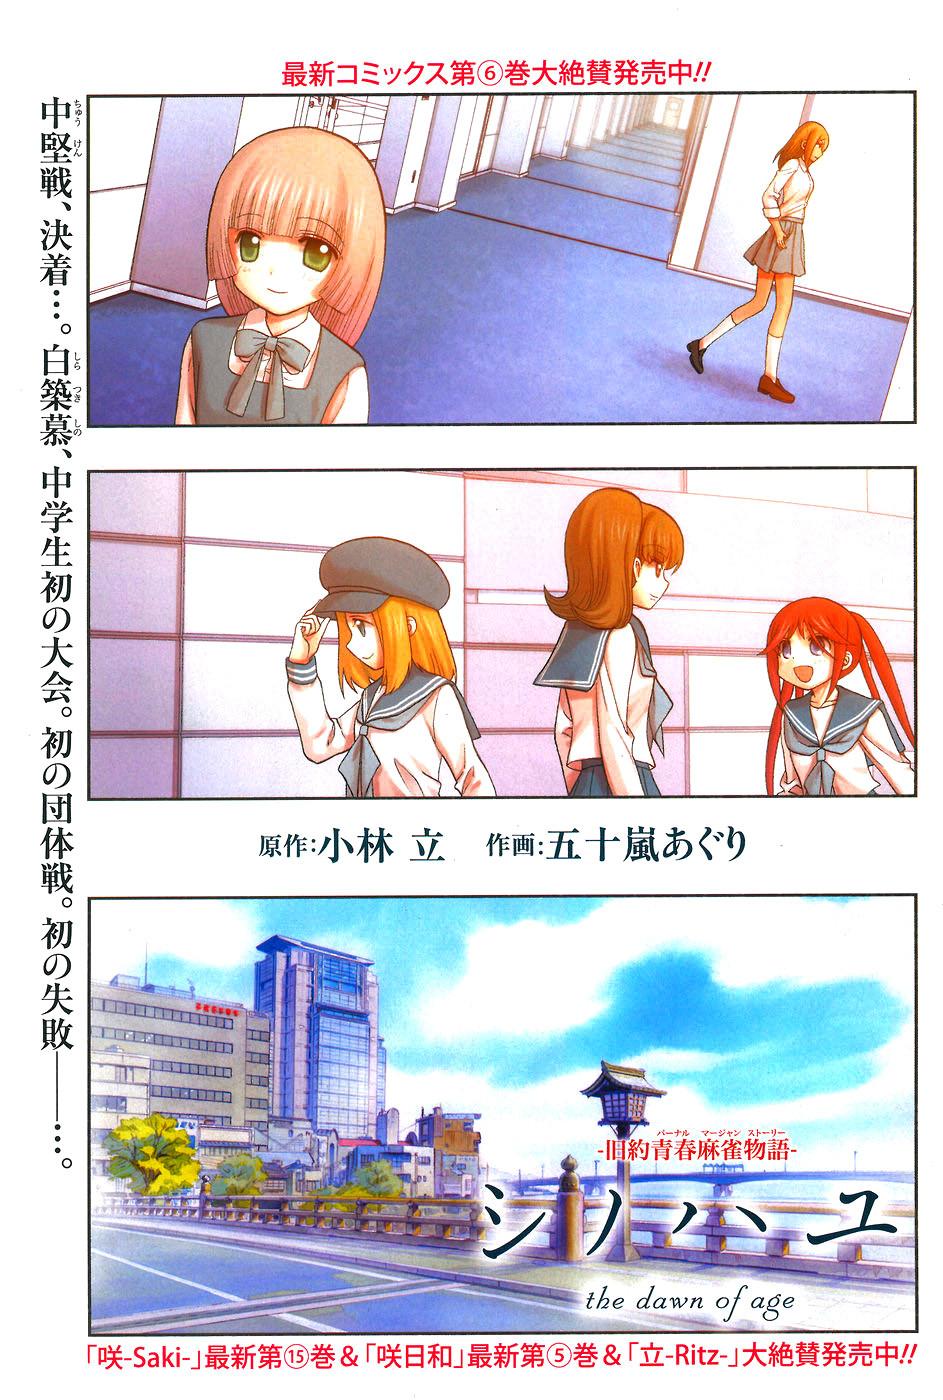 Shinohayu - The Dawn of Age Manga - Chapter 034 - Page 1